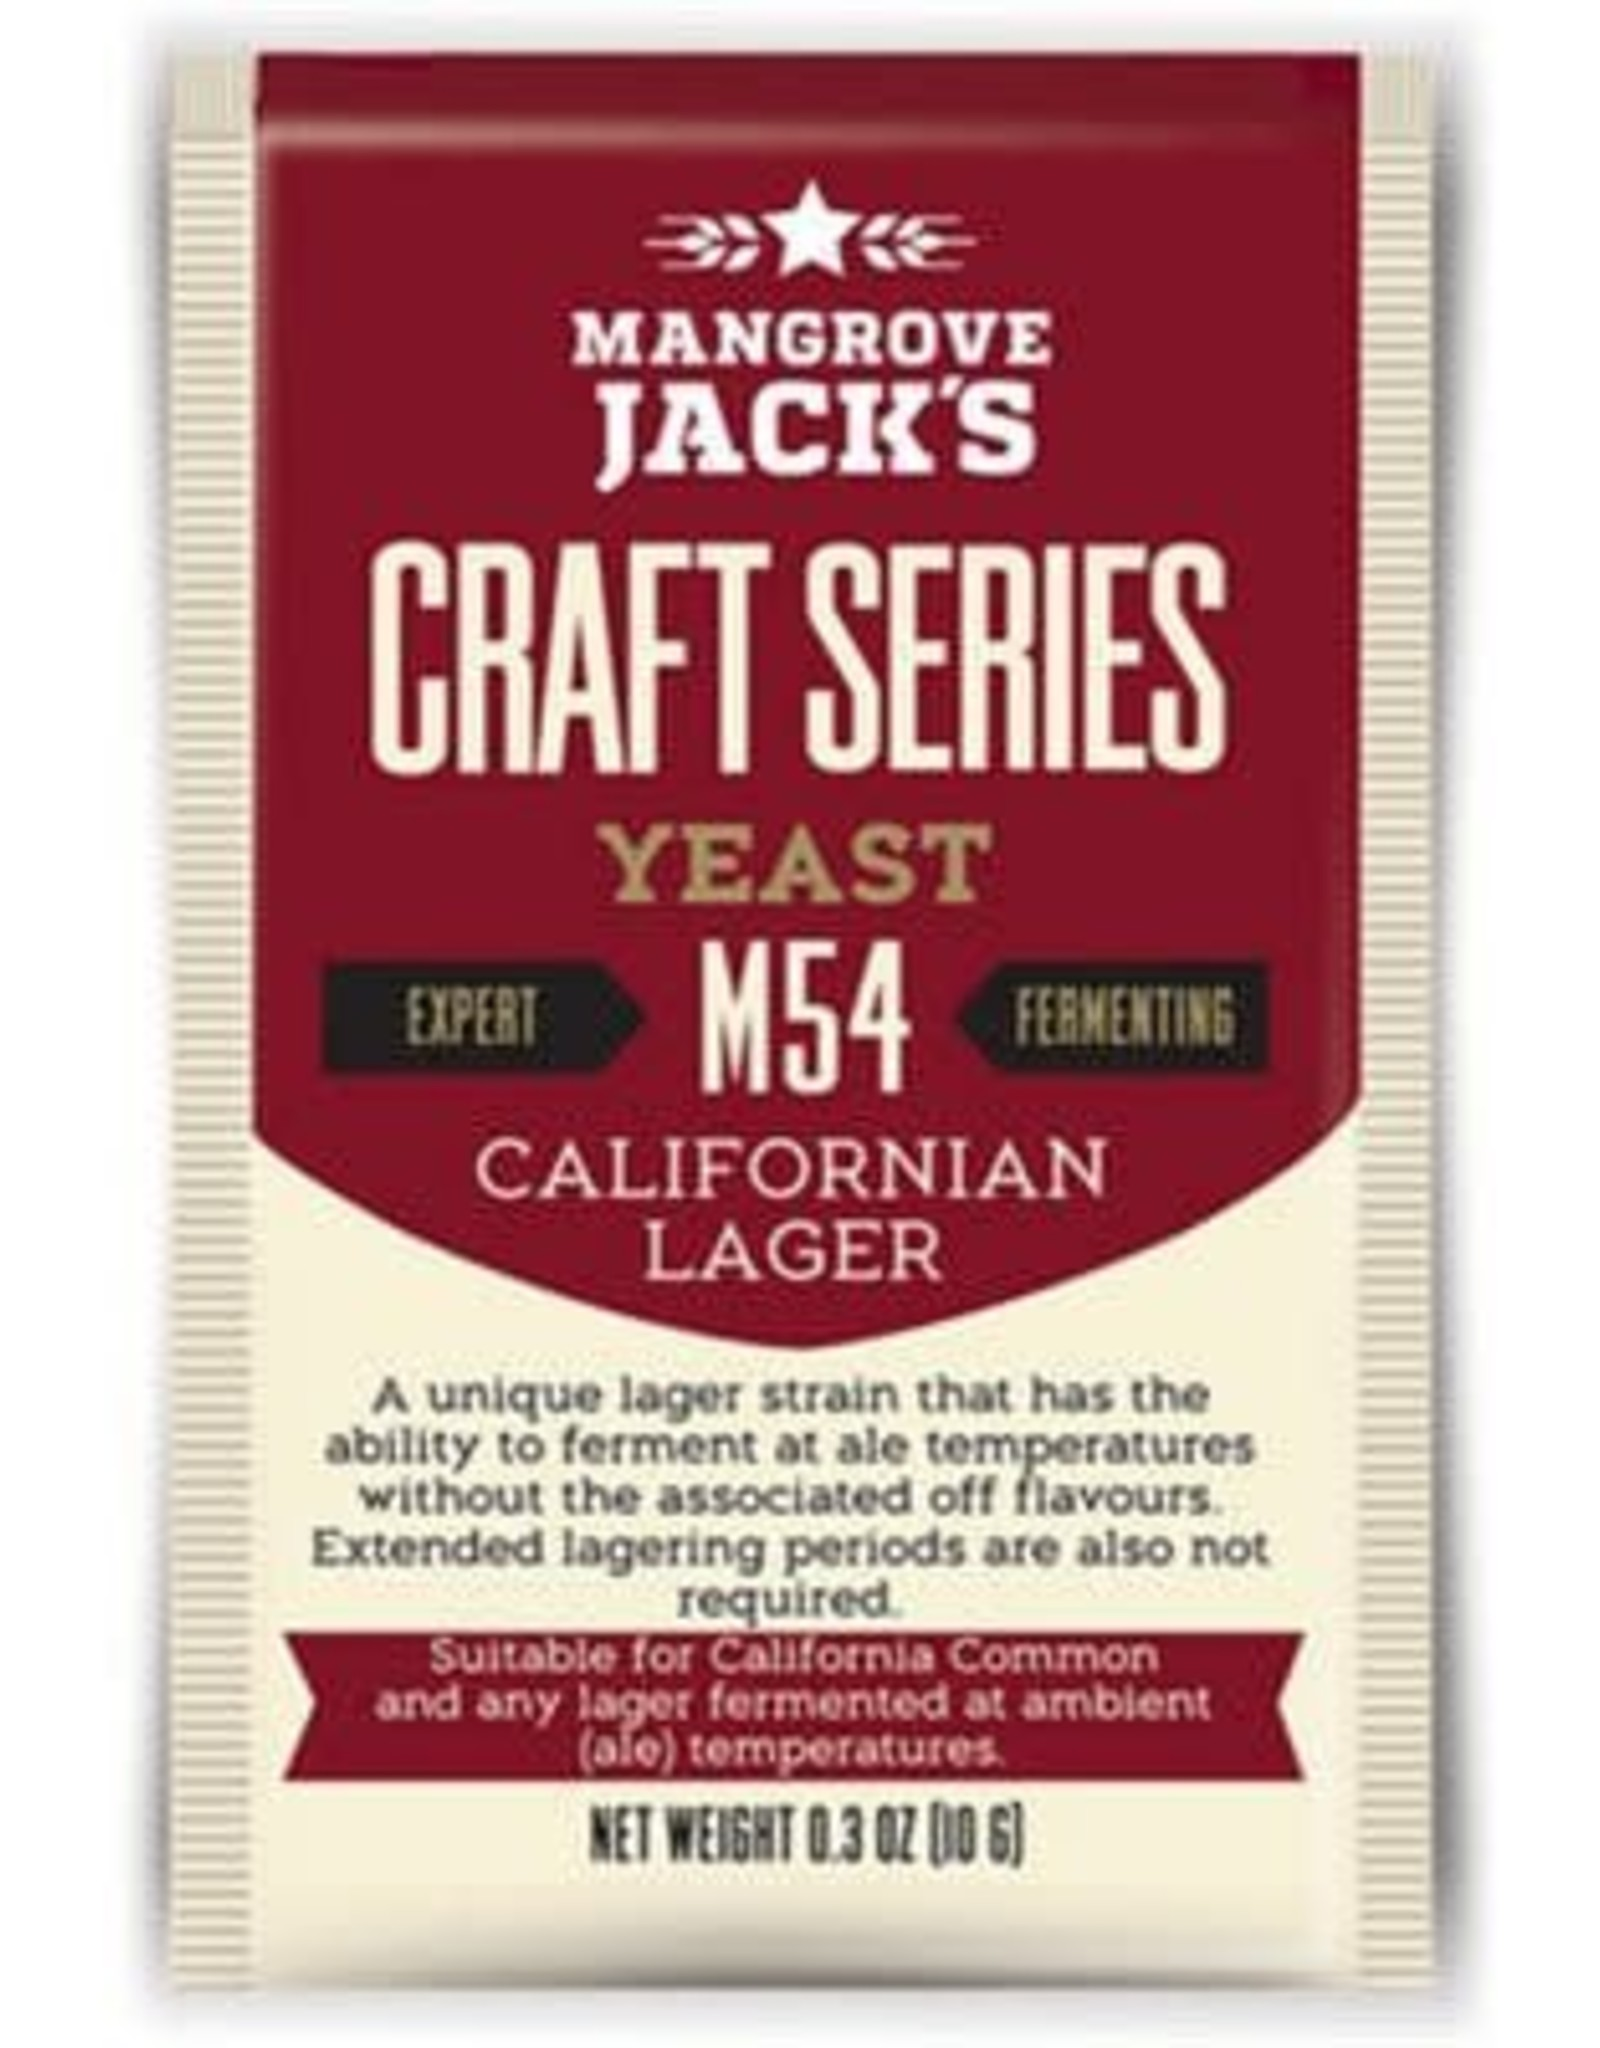 MANGROVE JACK'S CALIFORNIA LAGER M54